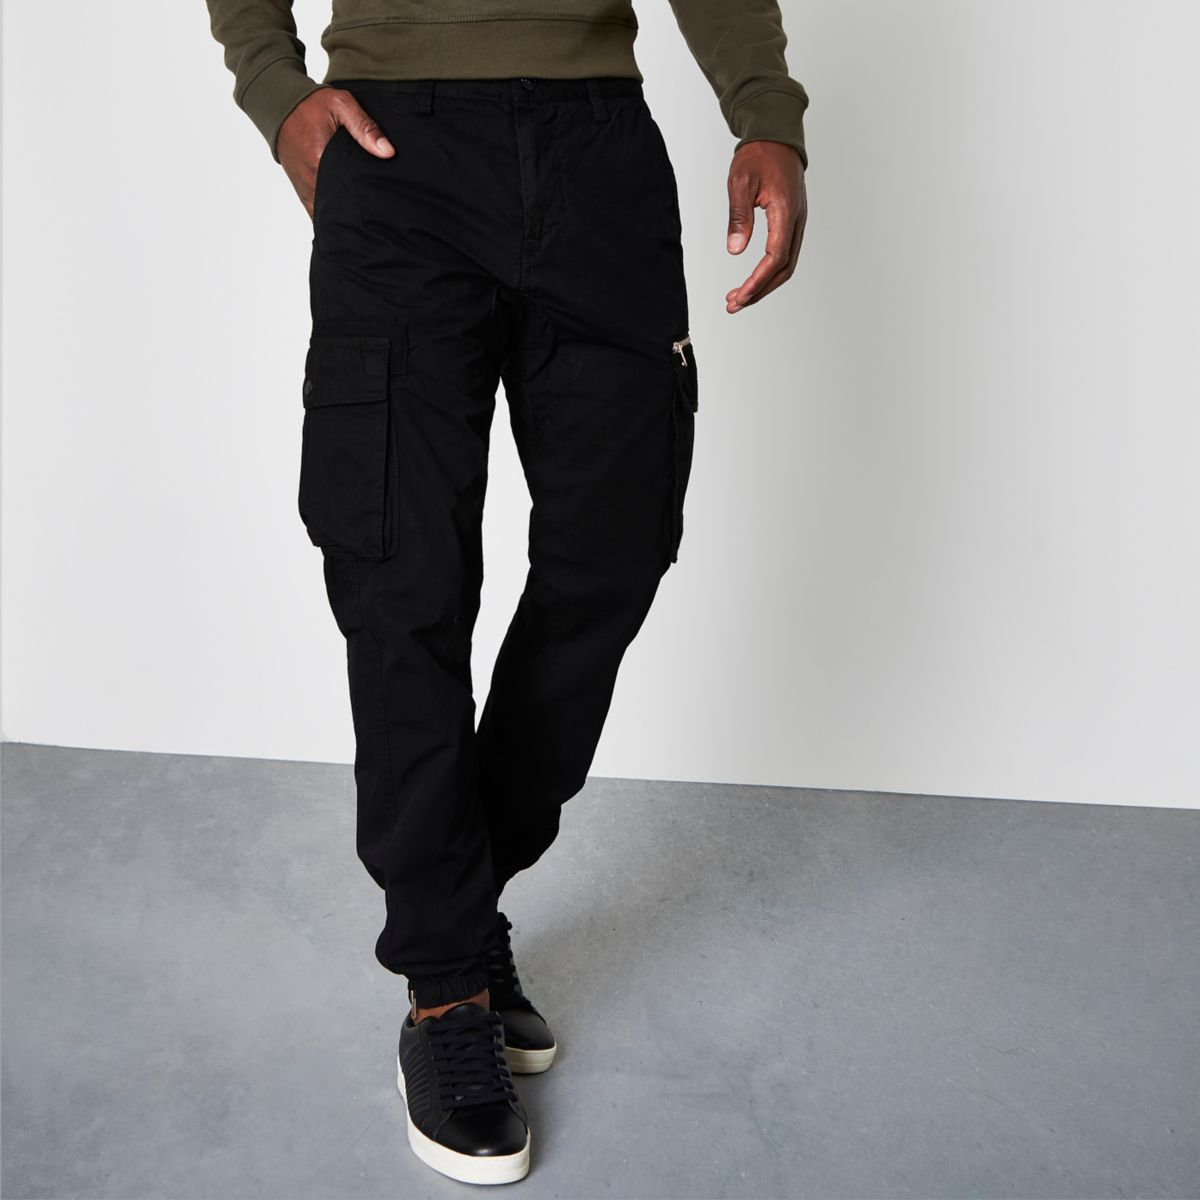 Black cargo jogger pants